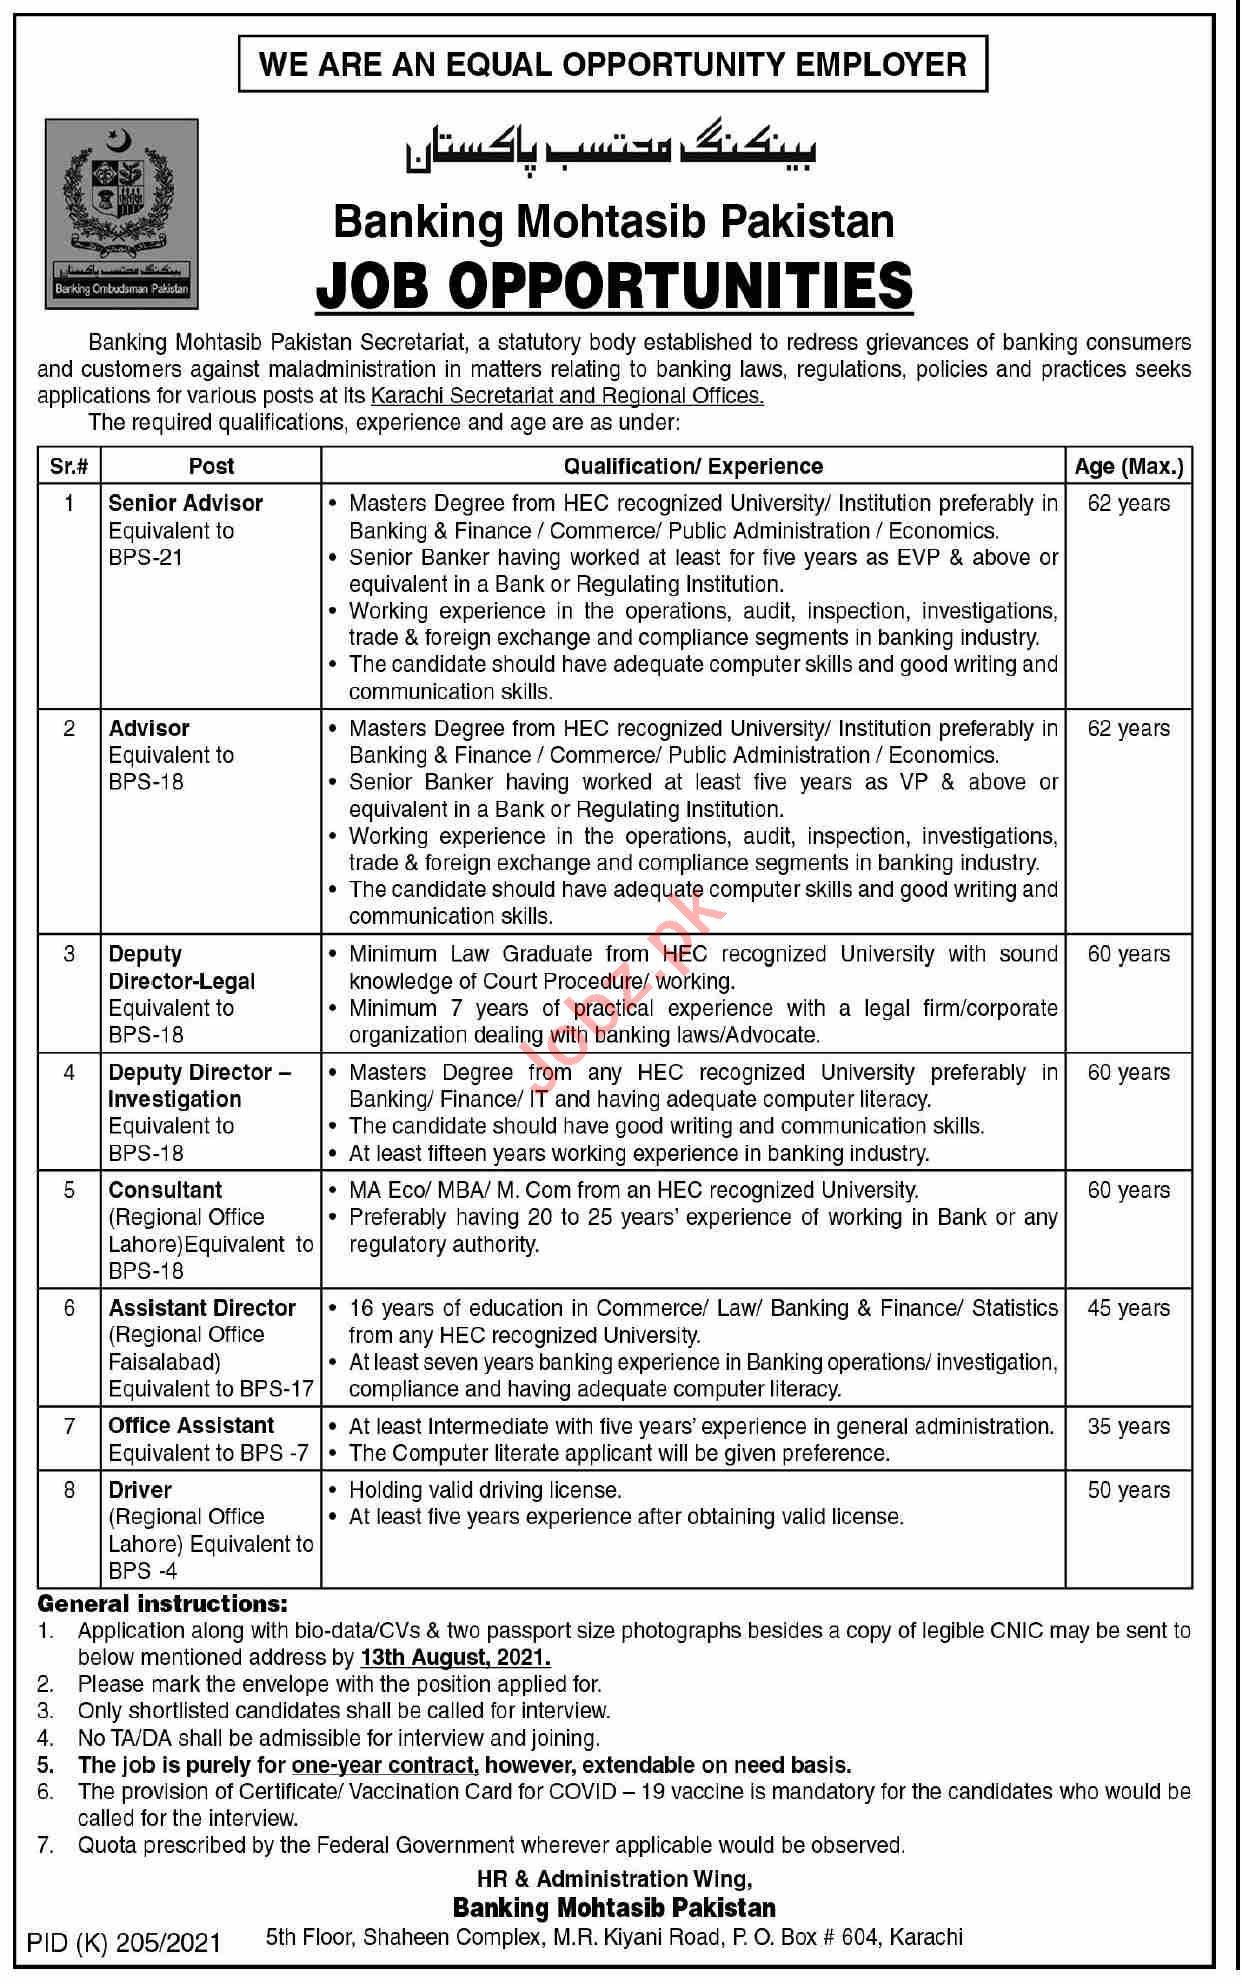 Banking Mohtasib Pakistan Karachi Secretariat Jobs 2021